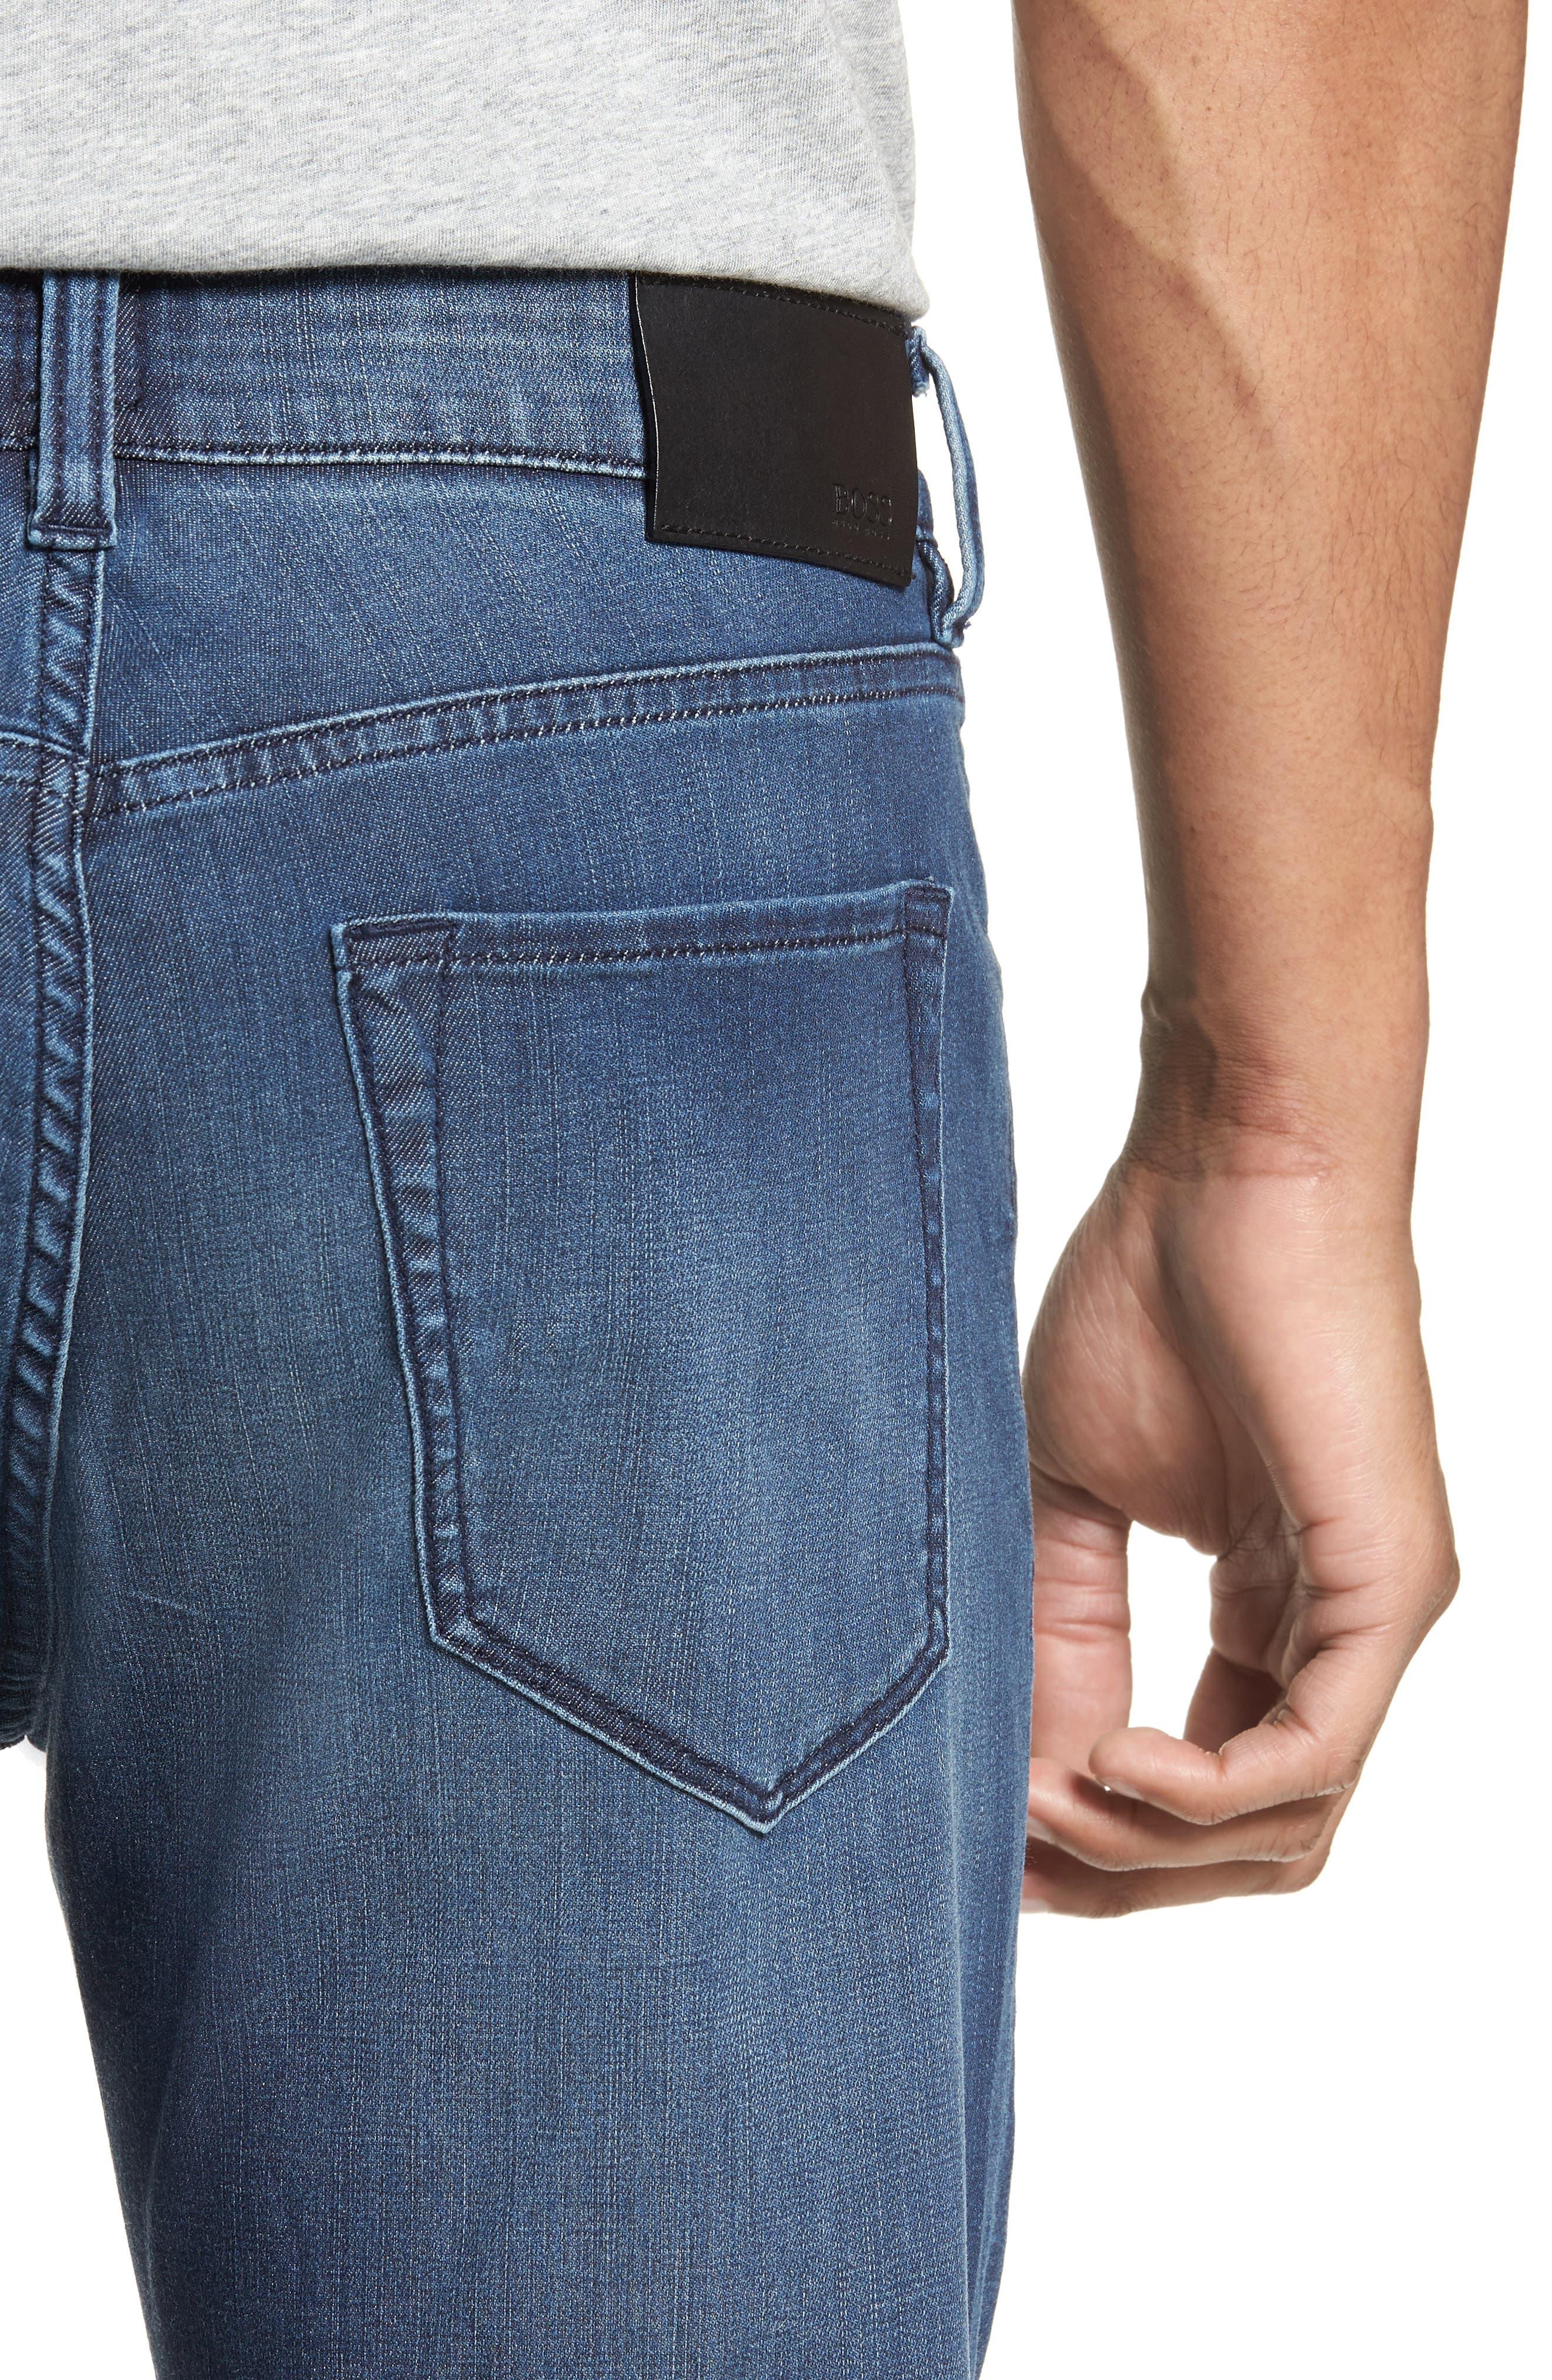 Maine Straight Leg Jeans,                             Alternate thumbnail 4, color,                             Blue